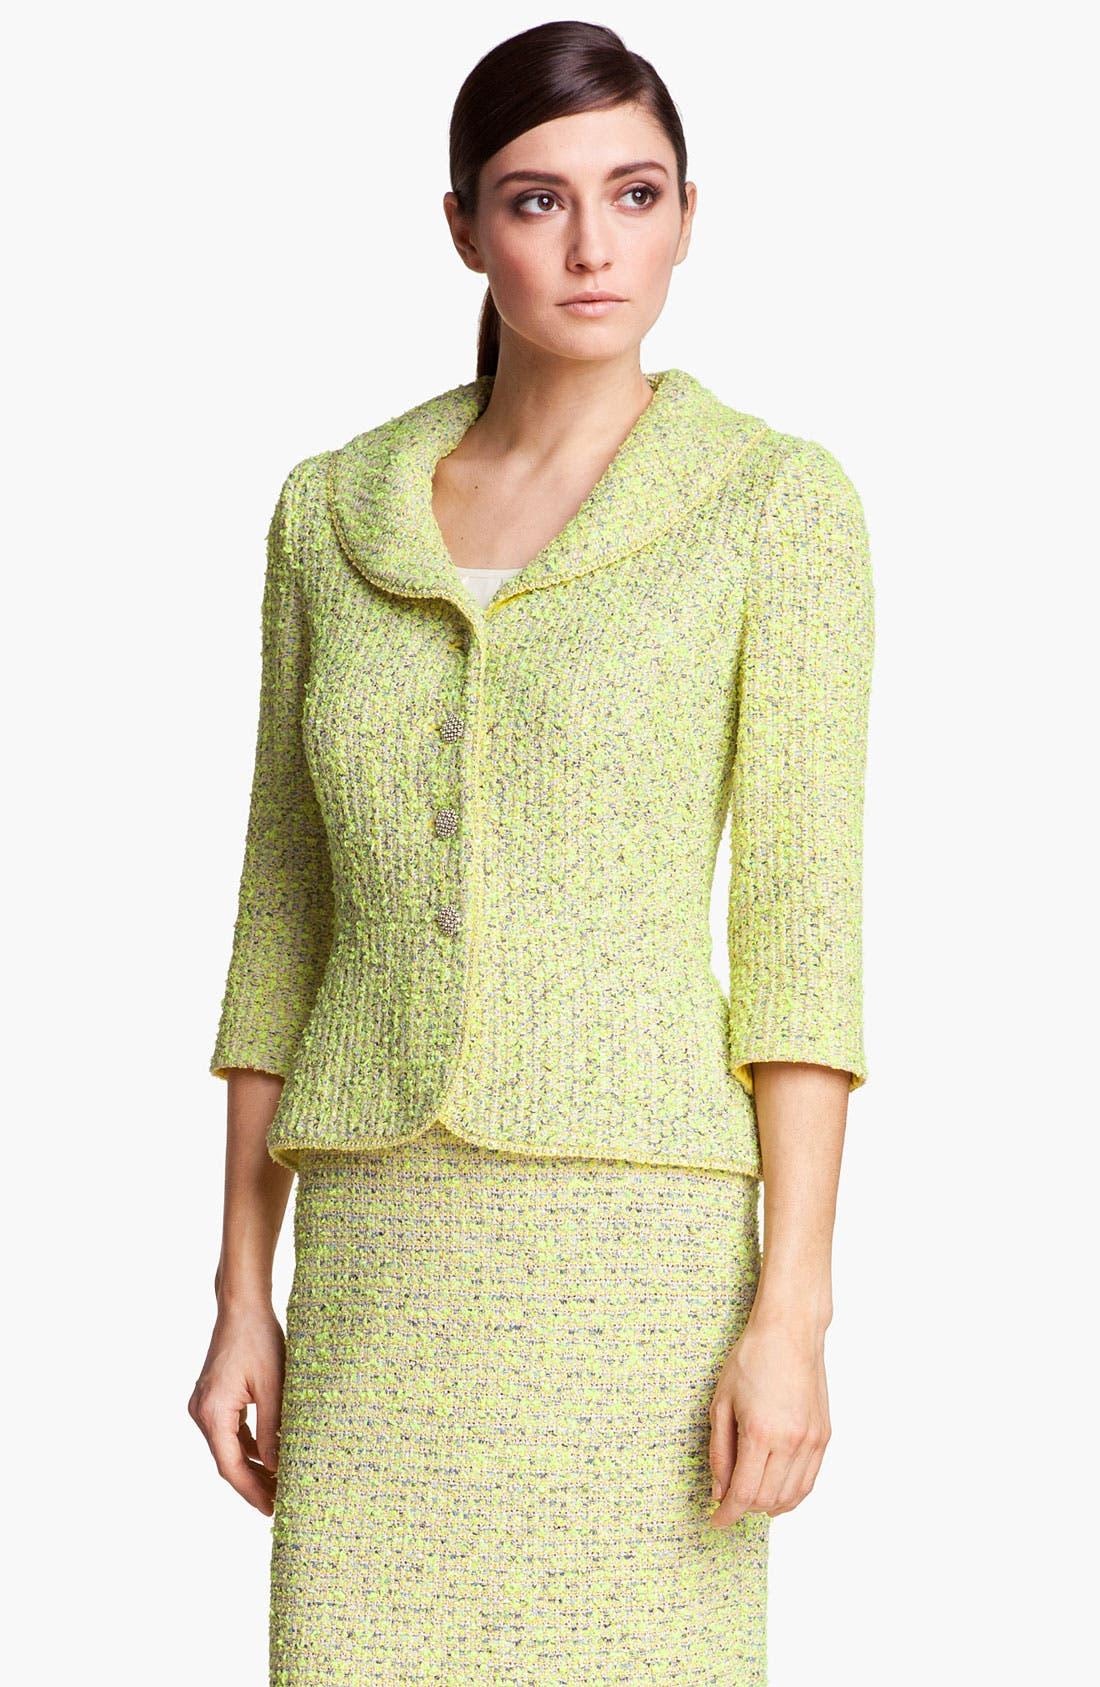 Alternate Image 1 Selected - St. John Collection 'Park Lane' Tweed Jacket